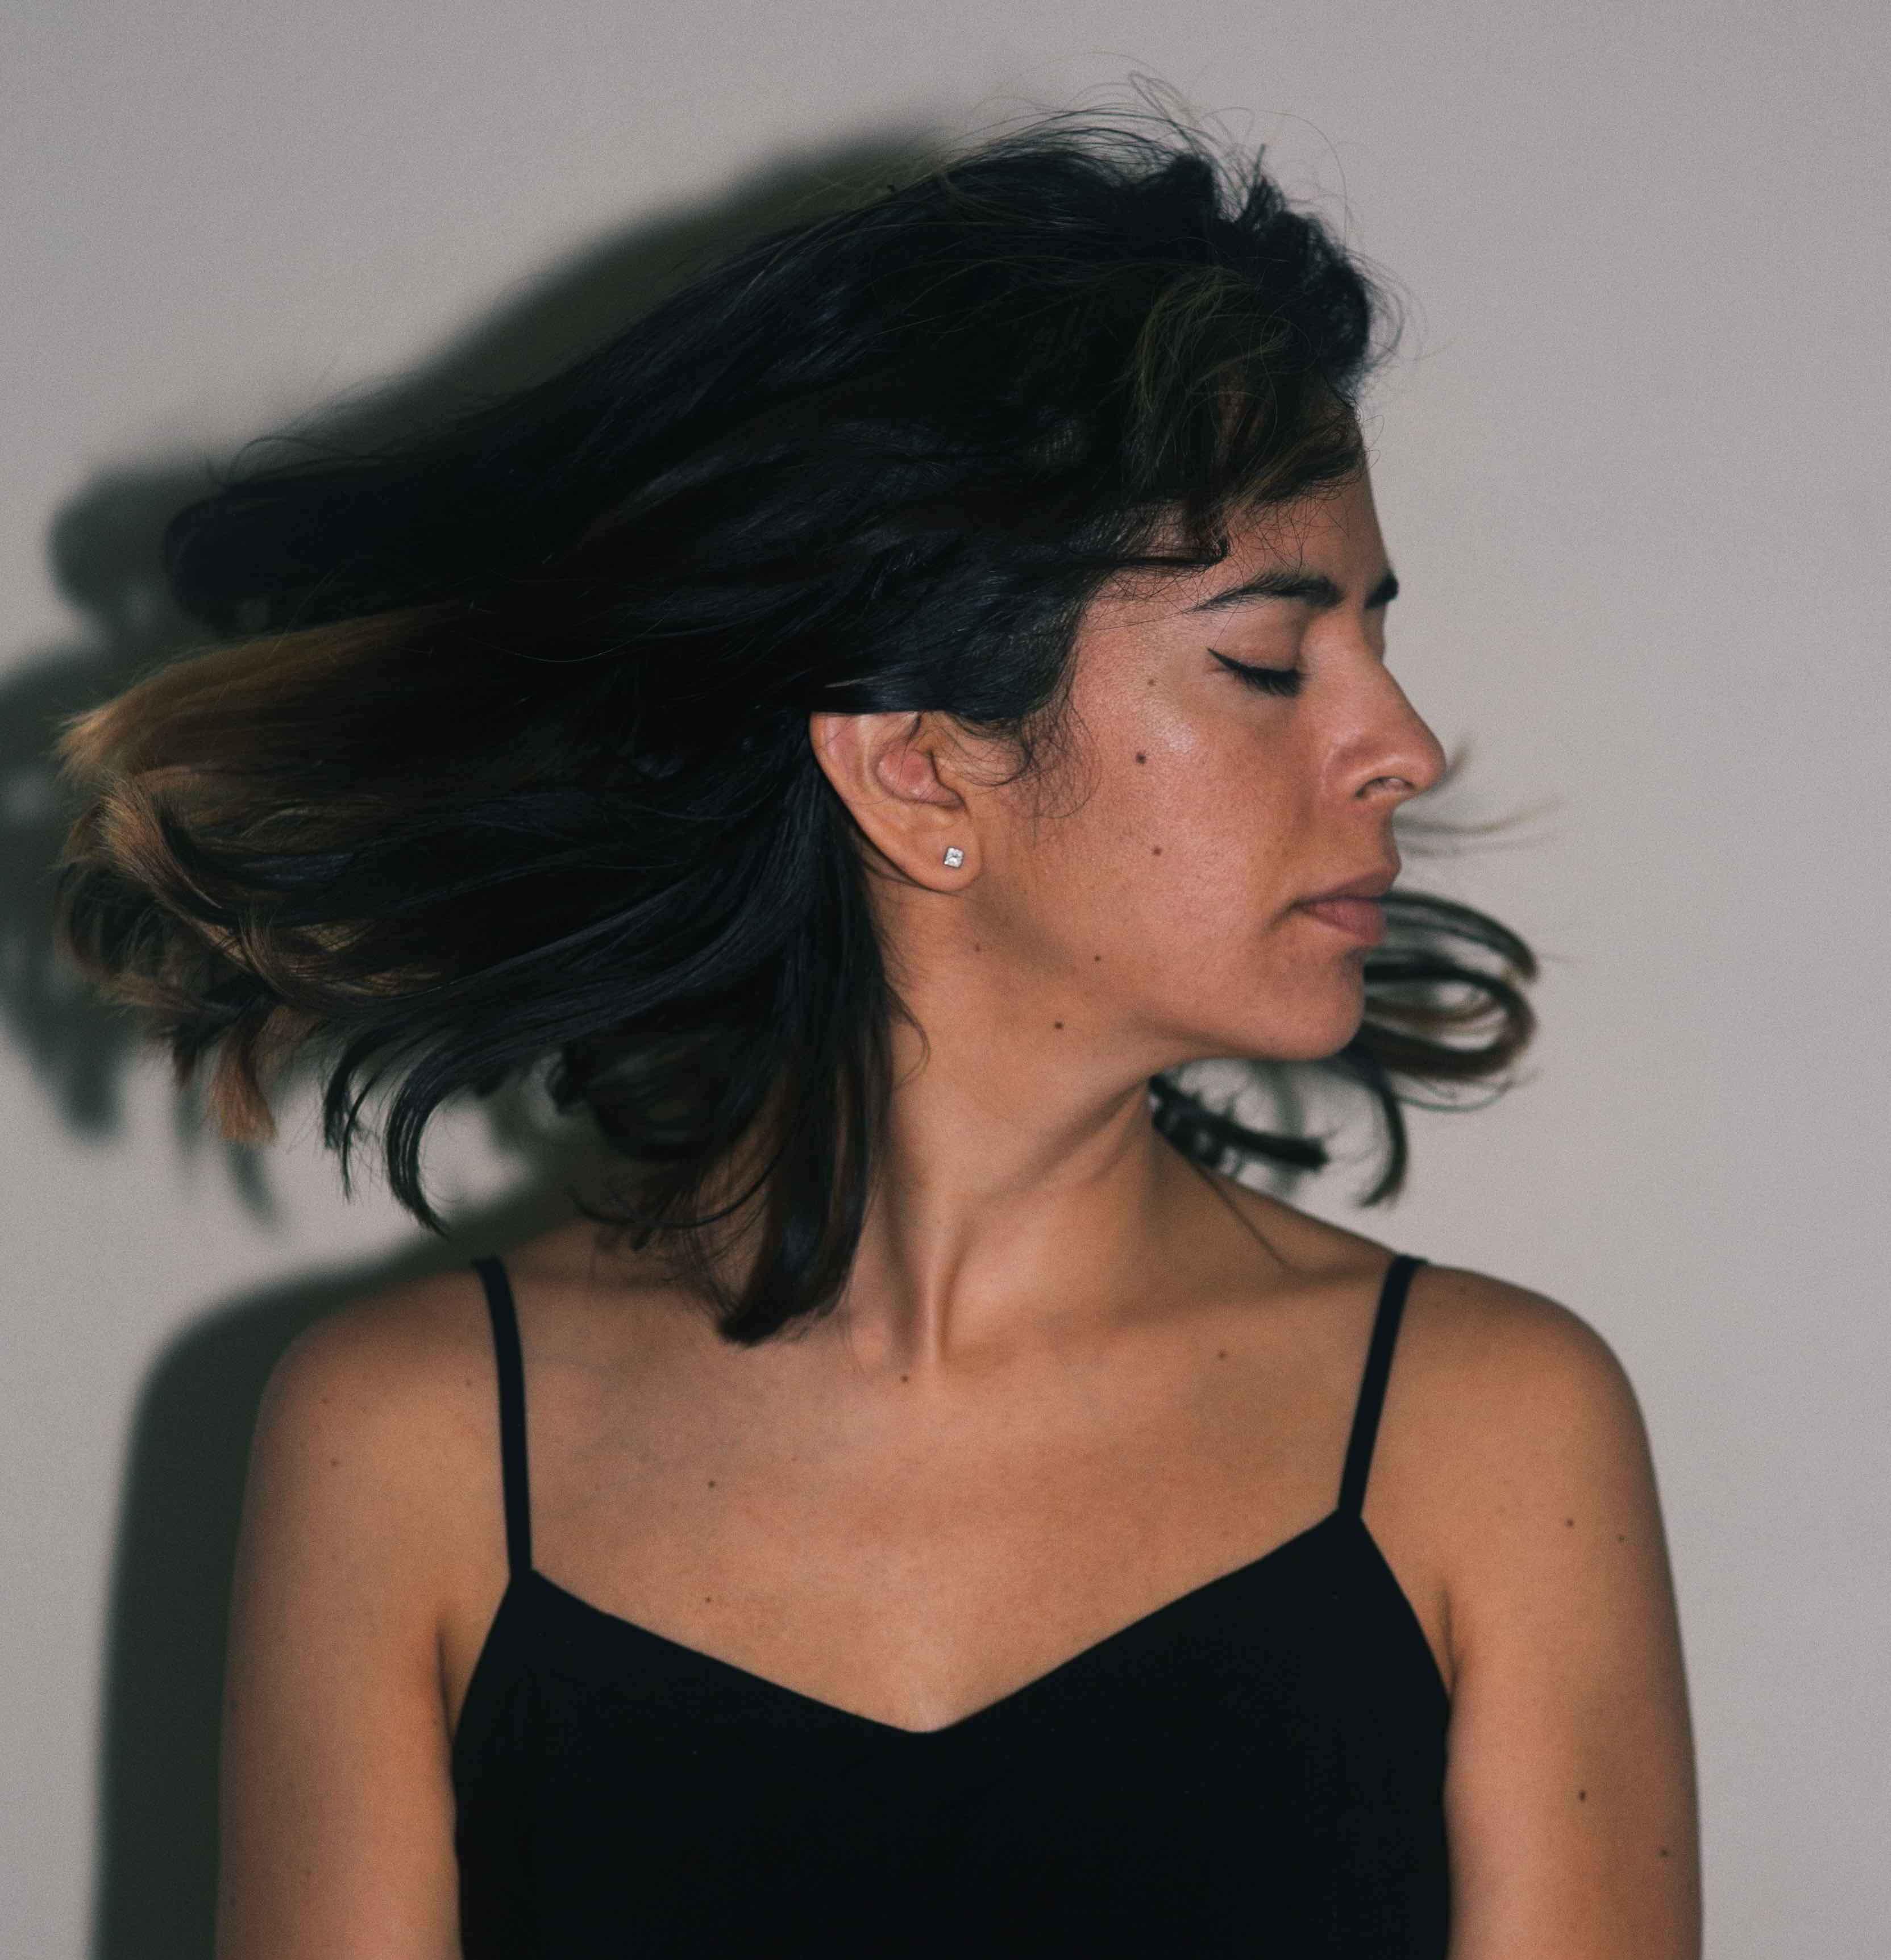 Go to Vanessa Ochotorena's profile